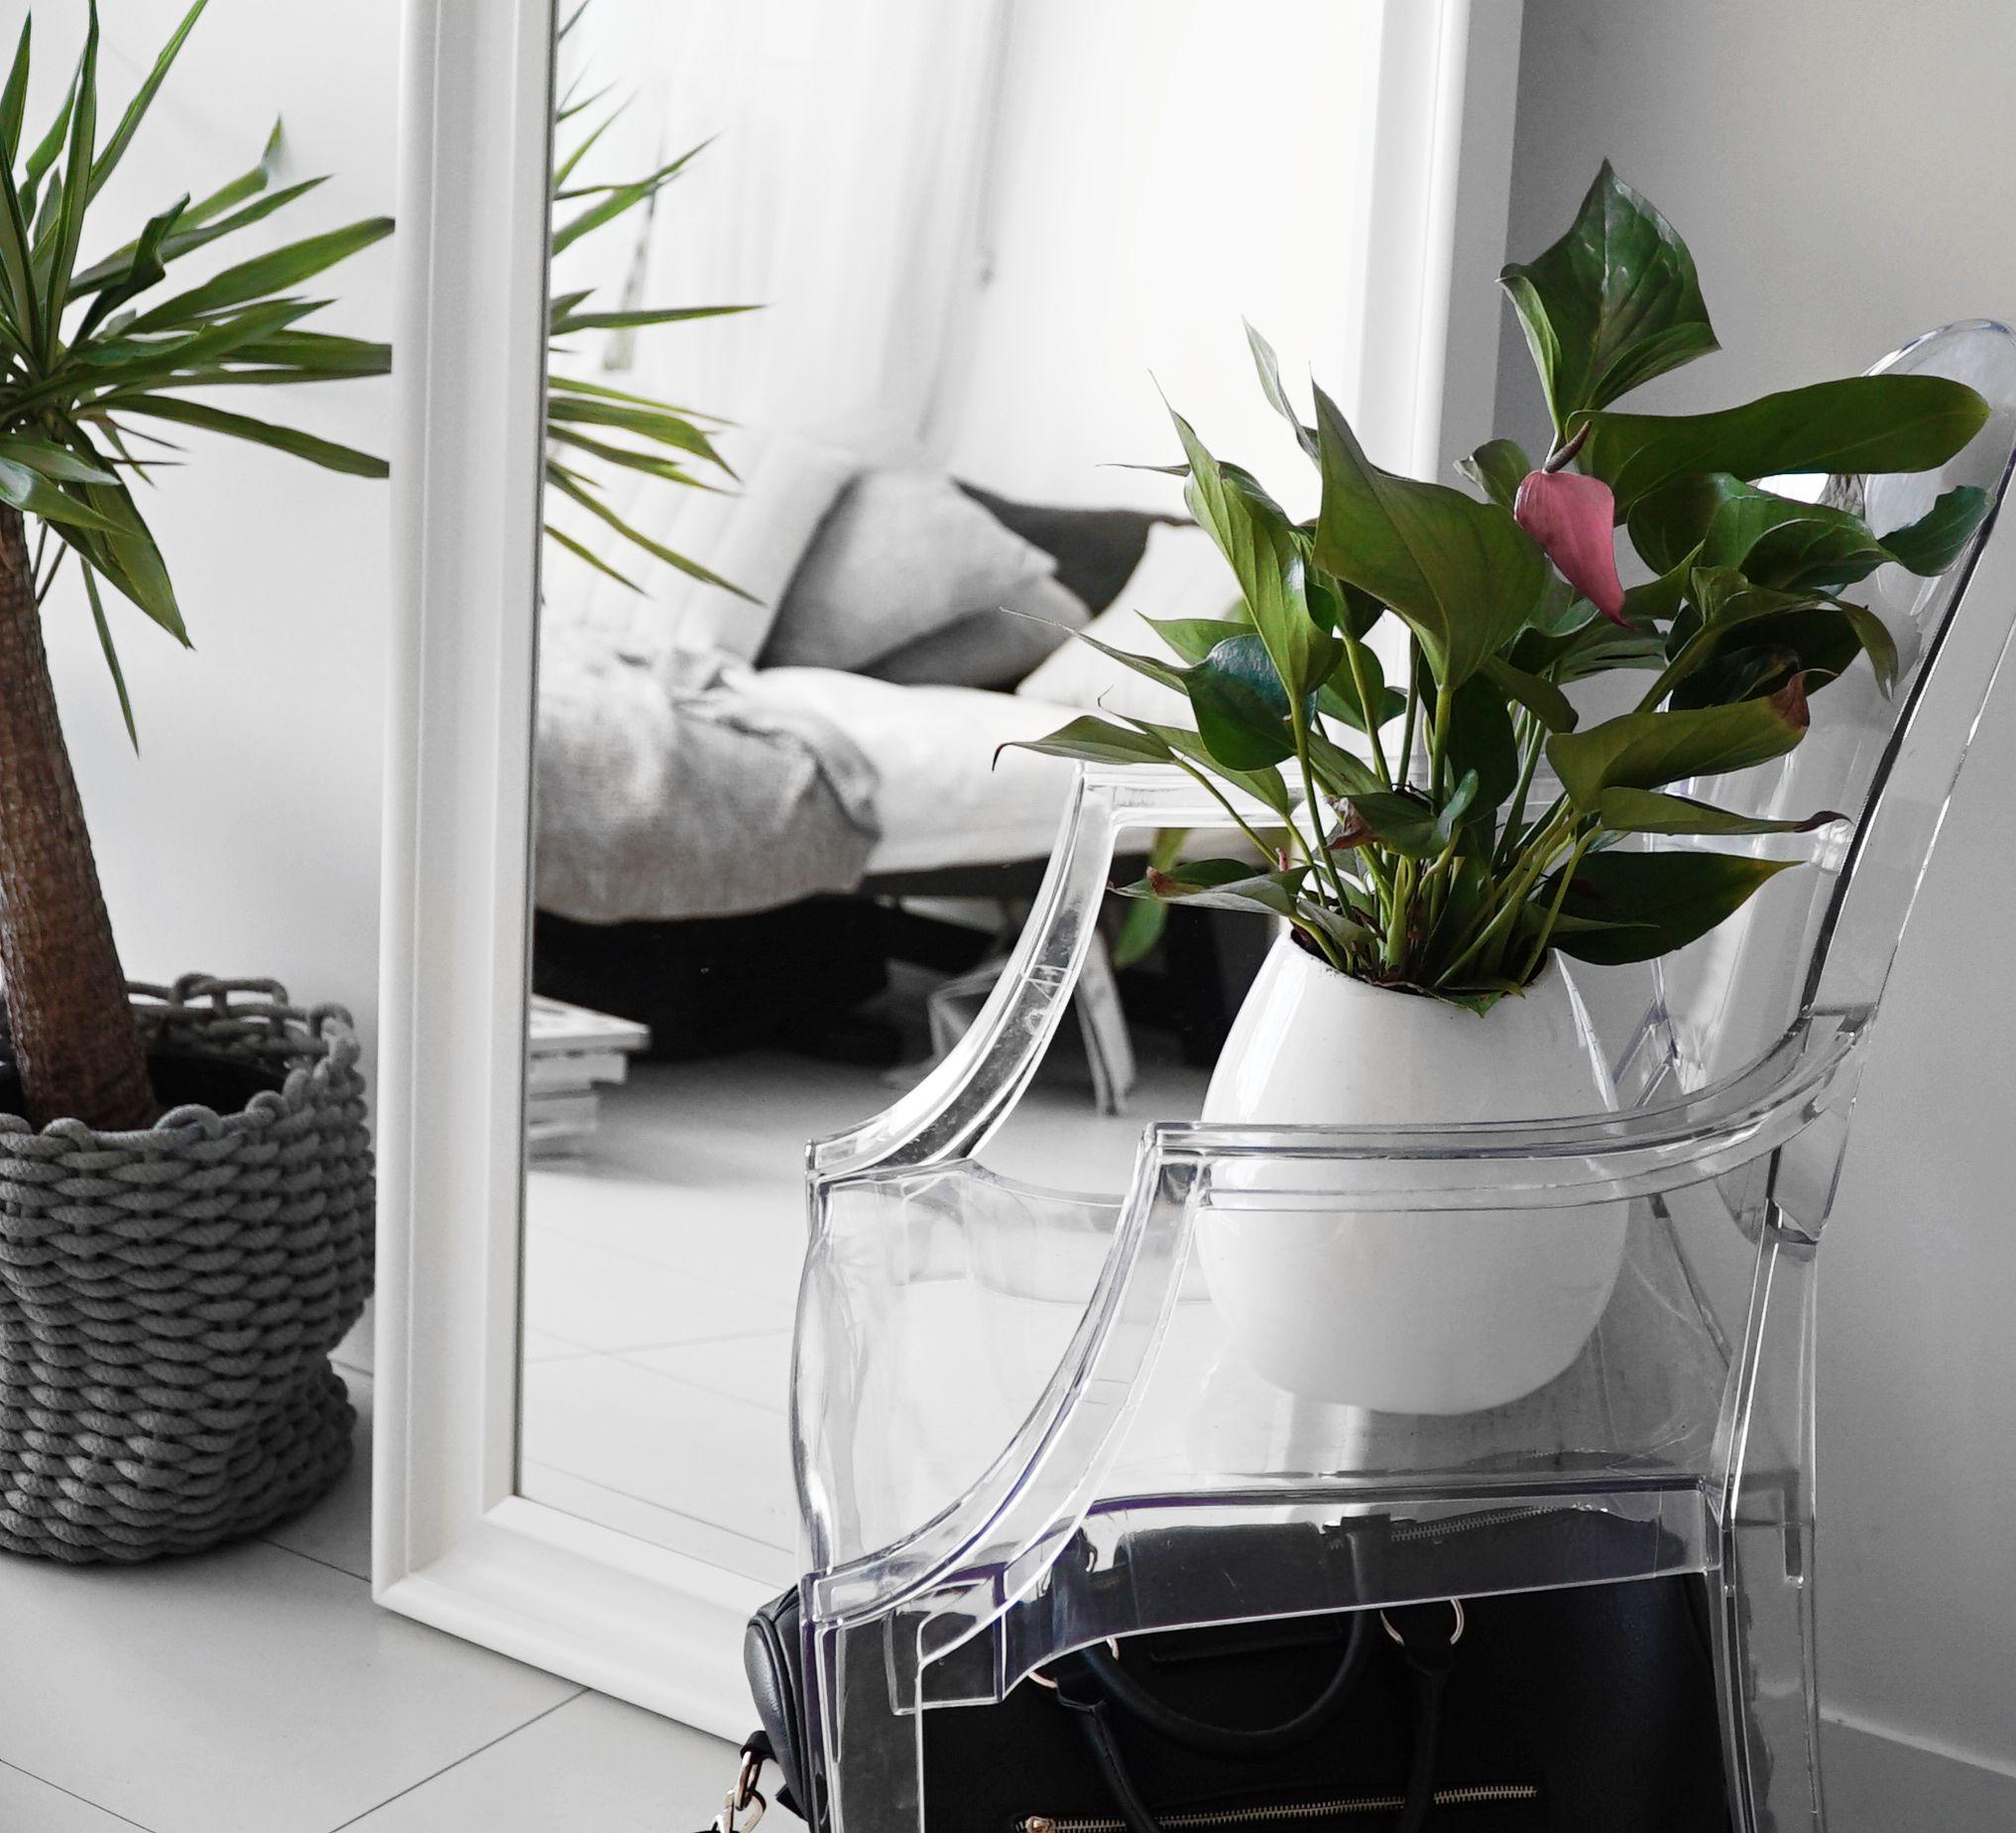 Living room plants   Plants   Pinterest   Living room plants, Living ...